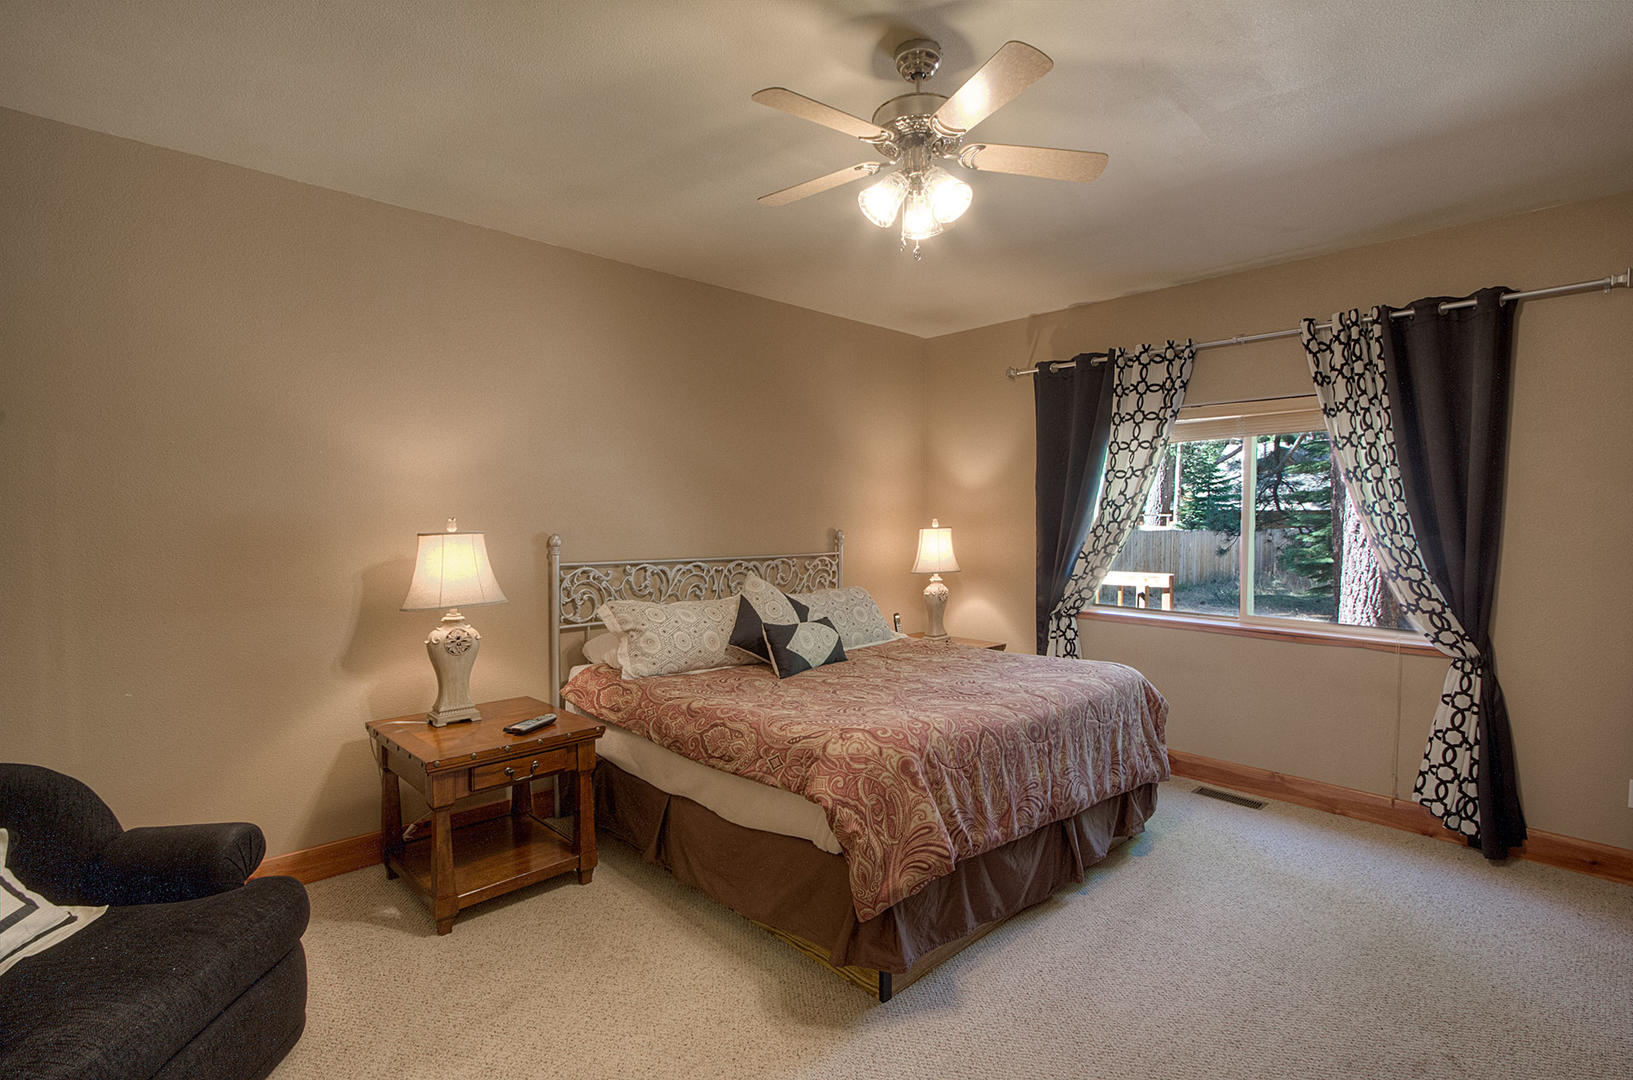 cyh1212 bedroom